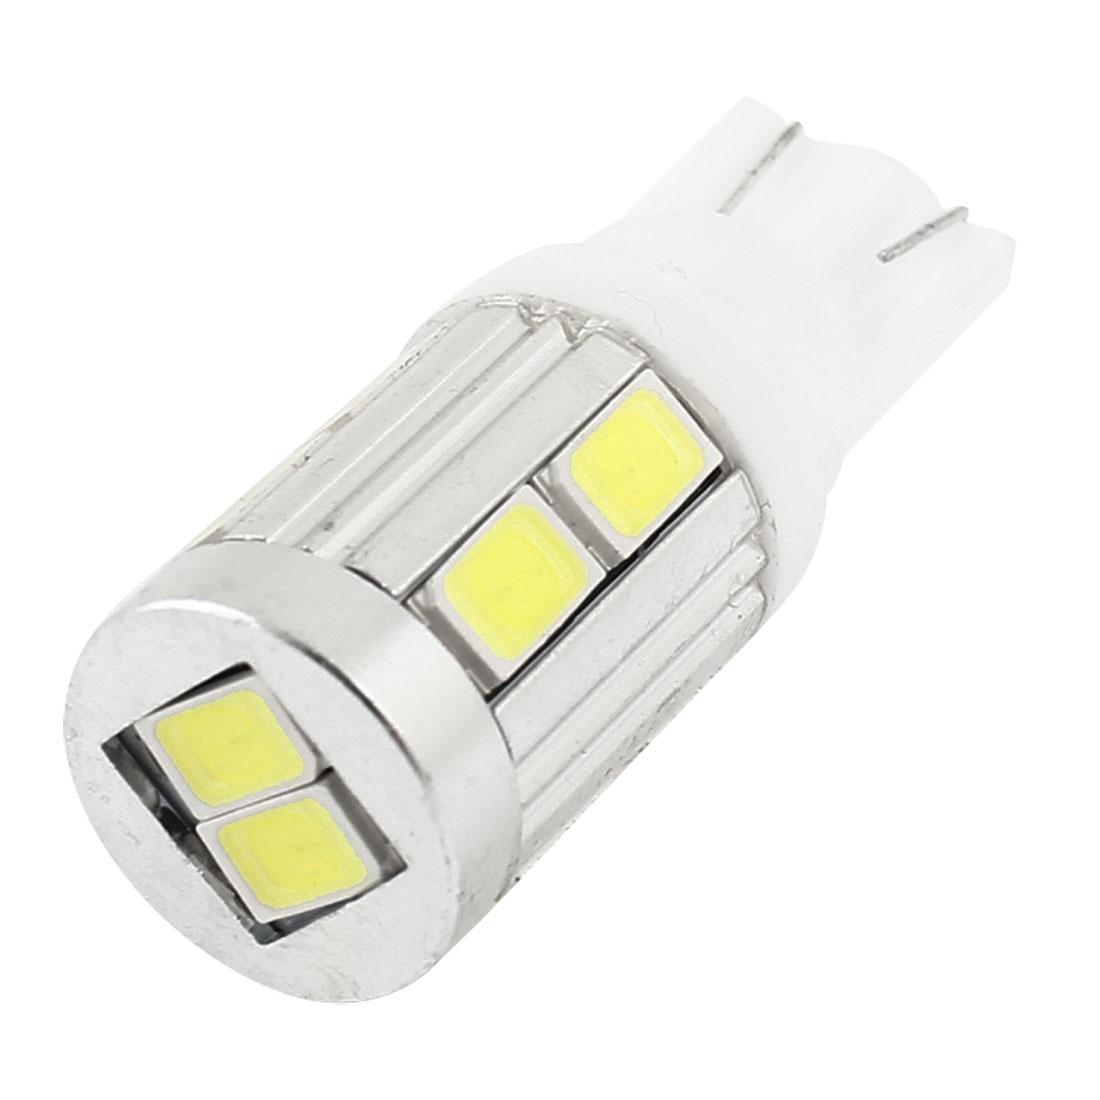 Car White T10 906 579 W5W 5630 SMD 10-LED Dashboard Light Lamp Bulb internal